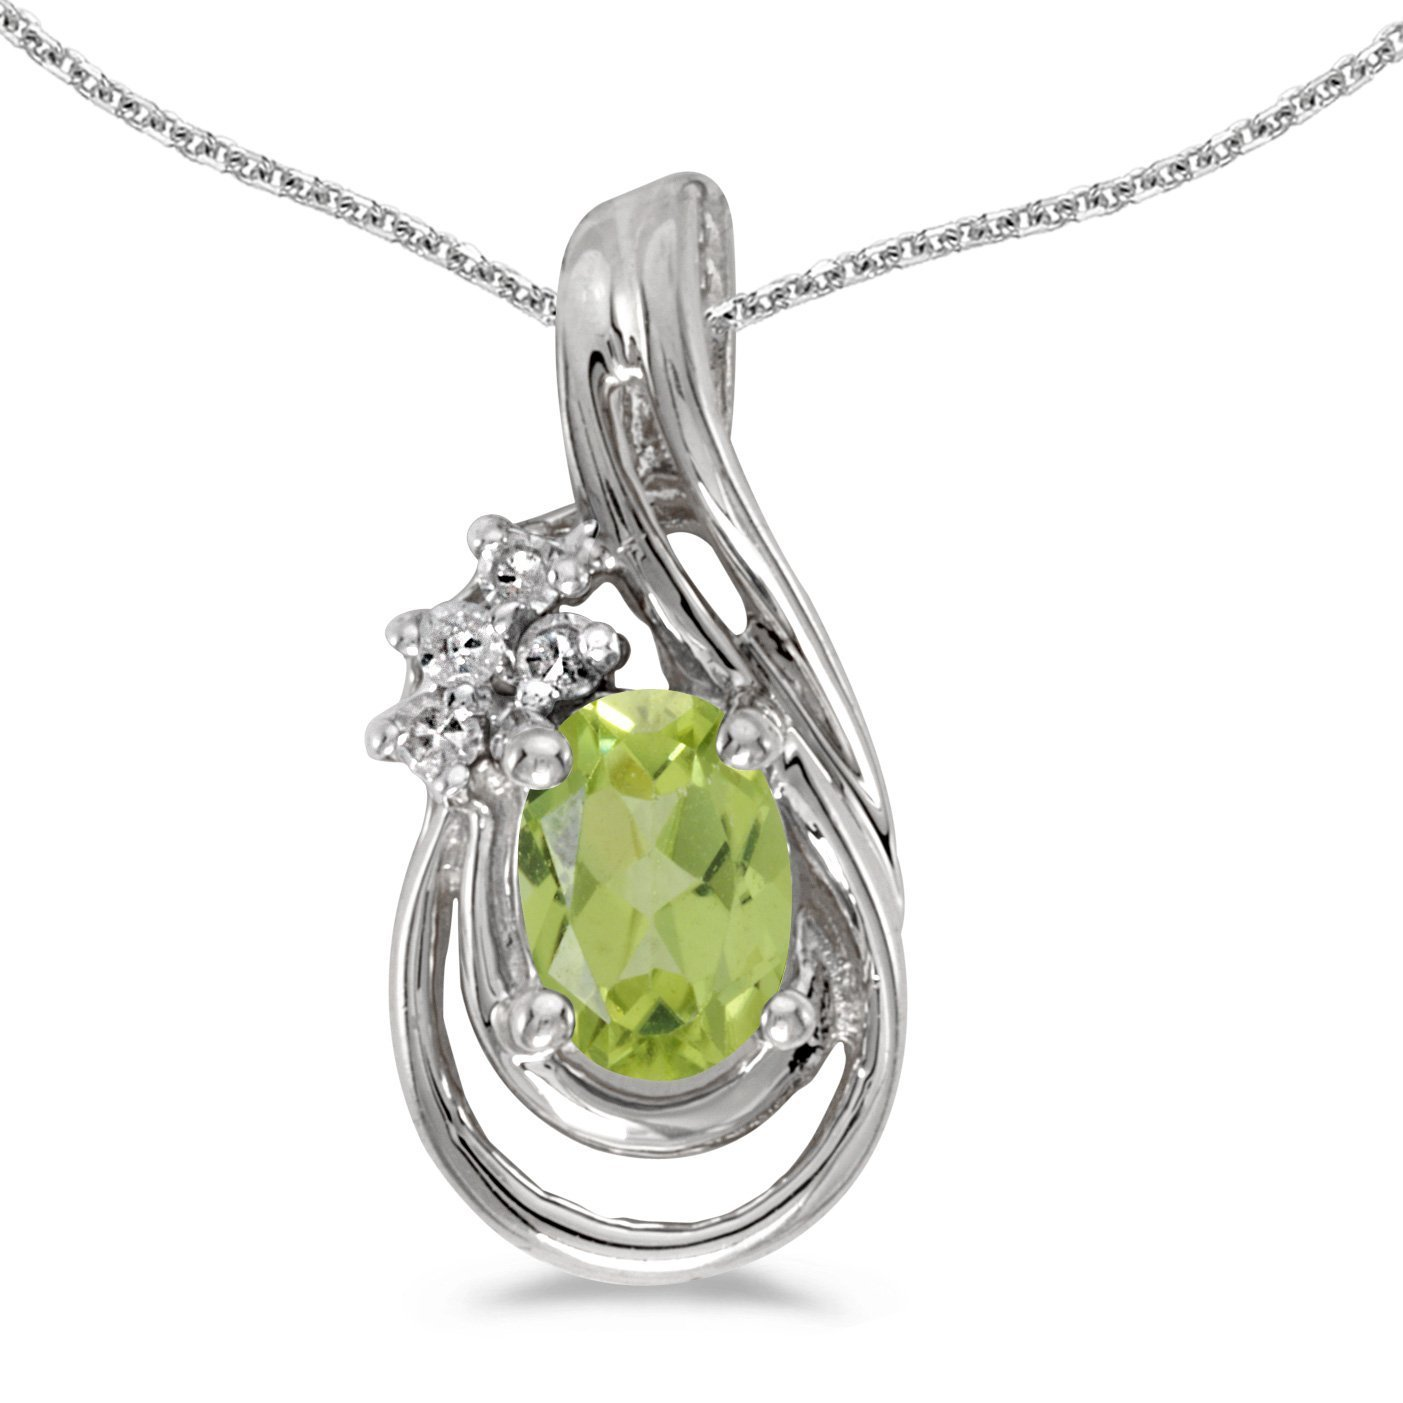 1//3 Cttw. FB Jewels Solid 14k White Gold Genuine Birthstone Oval Gemstone And Diamond Teardrop Pendant